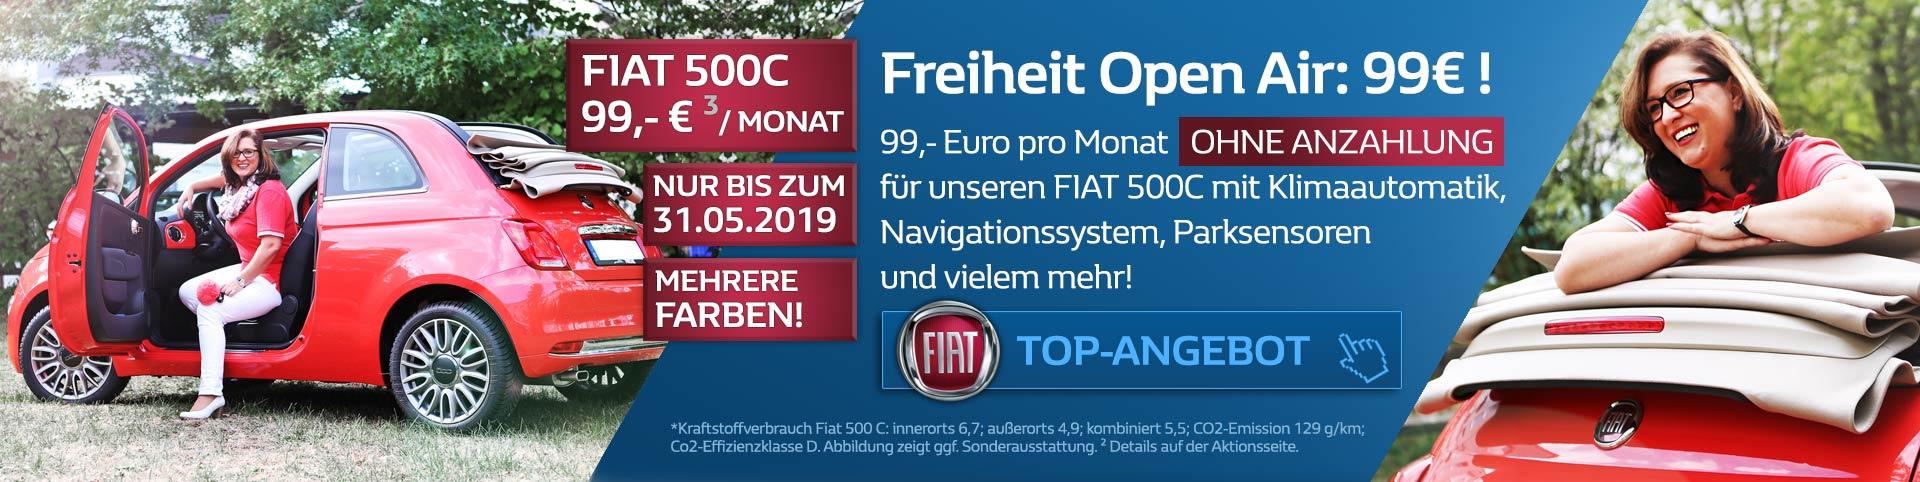 Fiat 500C Finanzierung 99 Euro